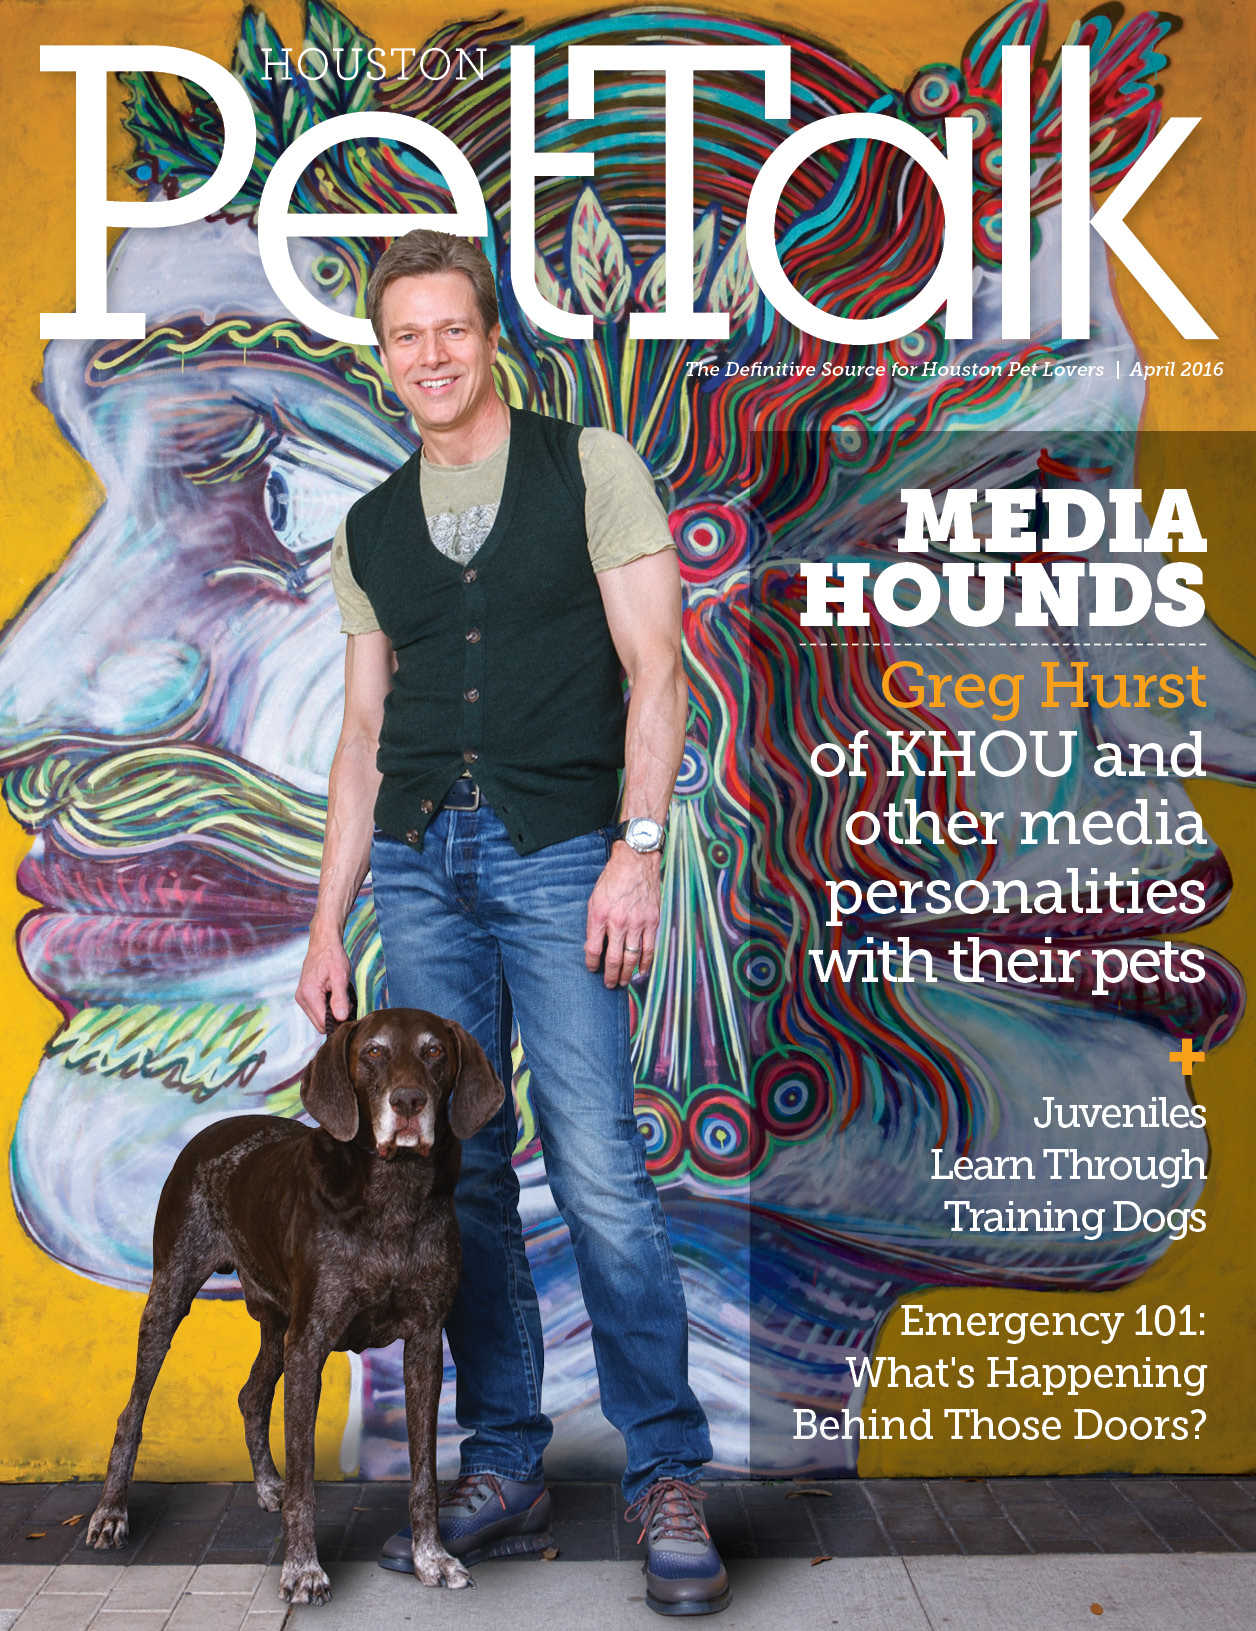 April 2016 Digital Issue of Houston PetTalk